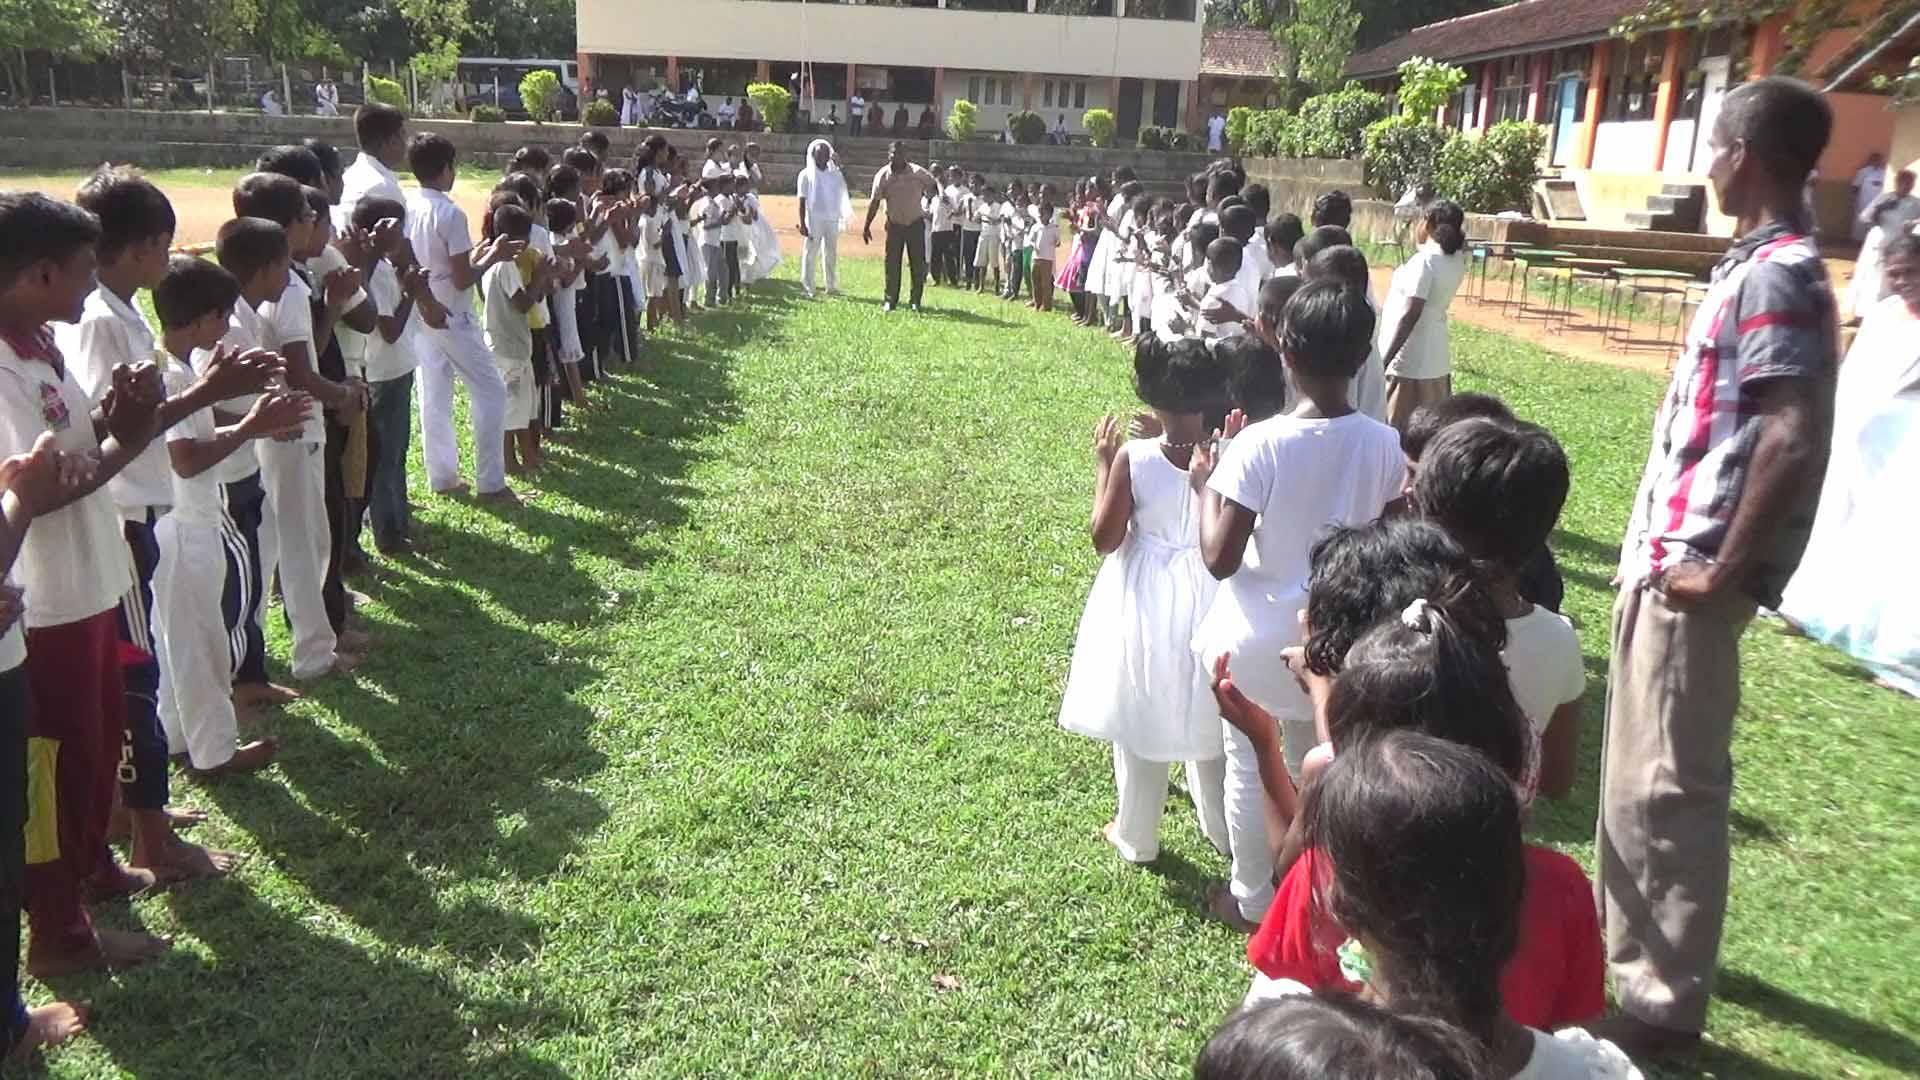 Sati Pasala Mindfulness Camp at Meethirigala Kanishta Vidyalaya-scouting activities (4)